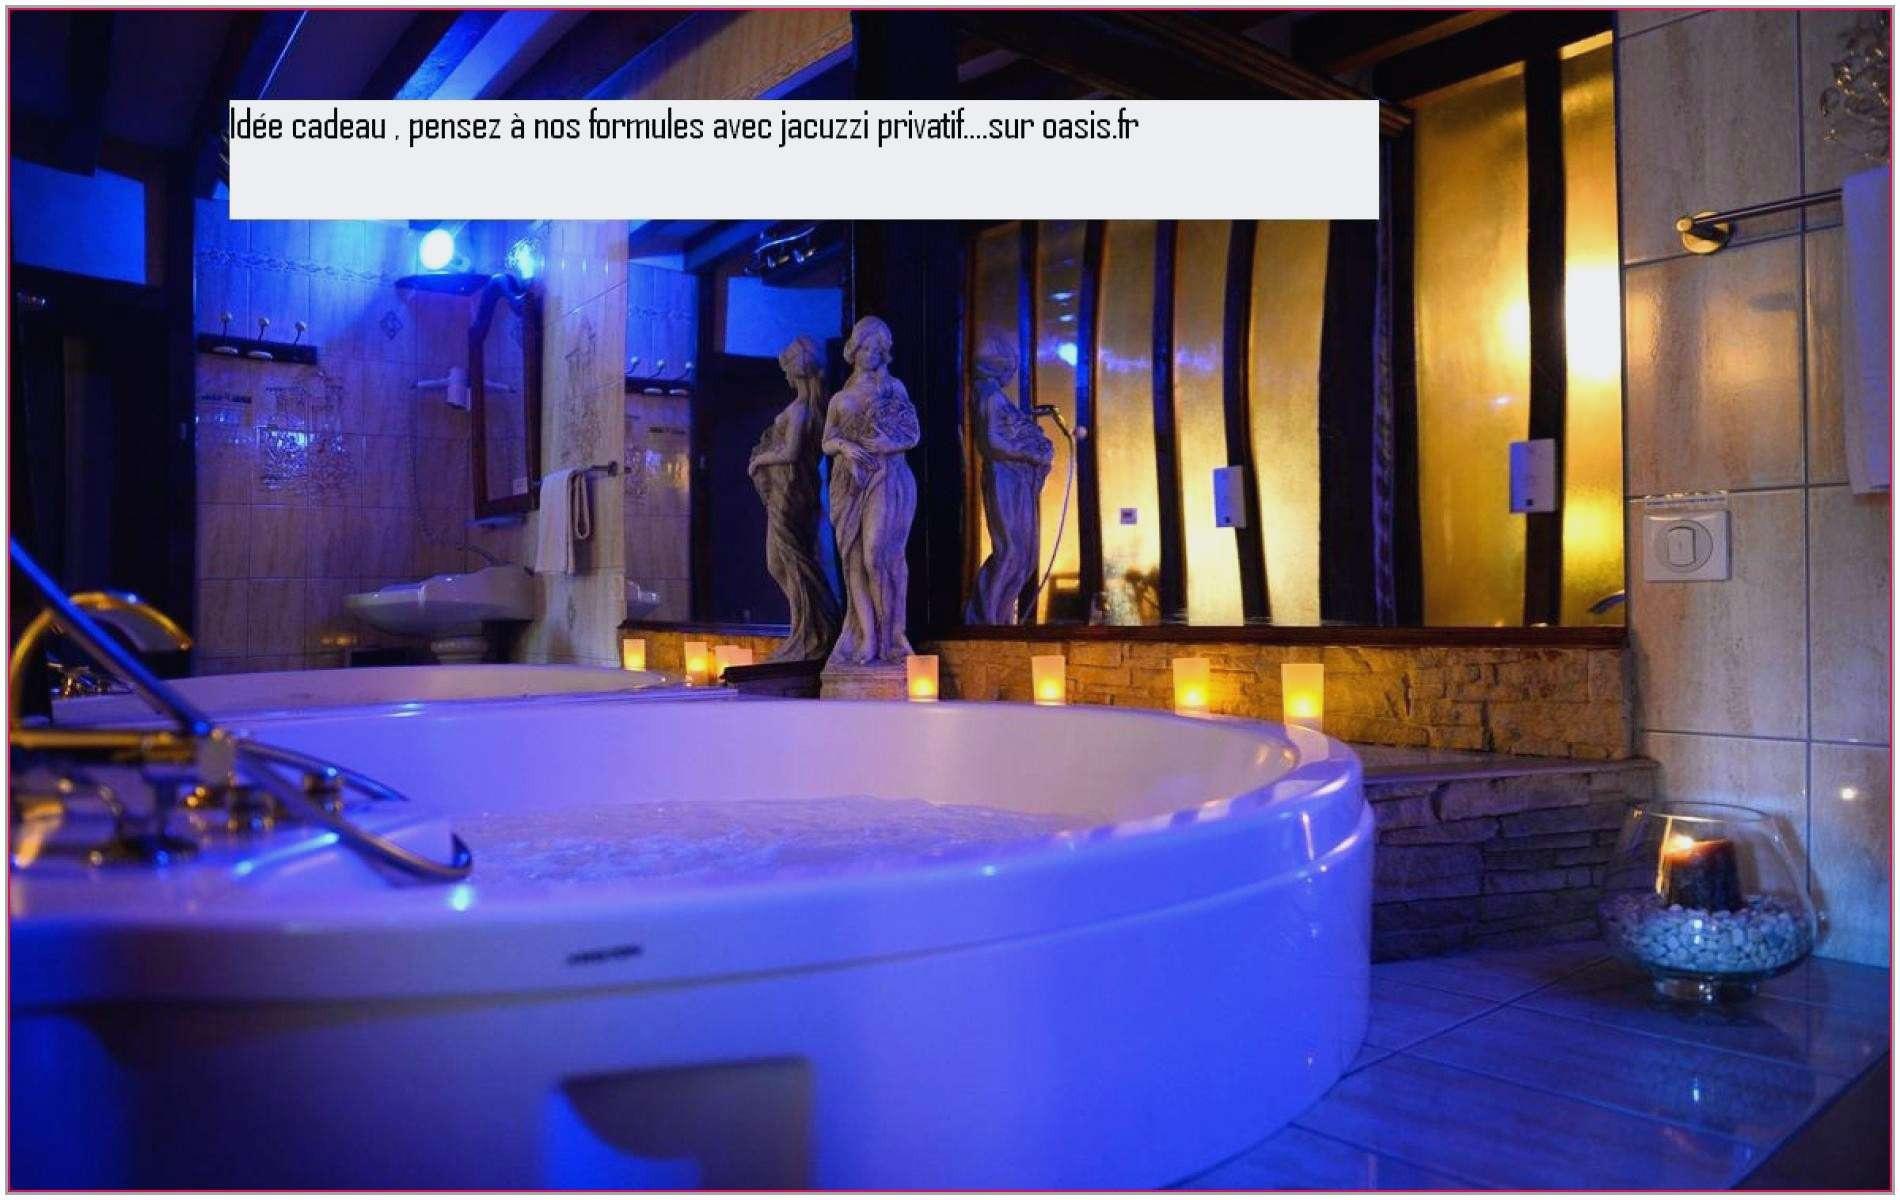 Chambre Avec Jacuzzi Privatif Bretagne Meilleur De Spa encequiconcerne Chambre Avec Jacuzzi Privatif Bretagne